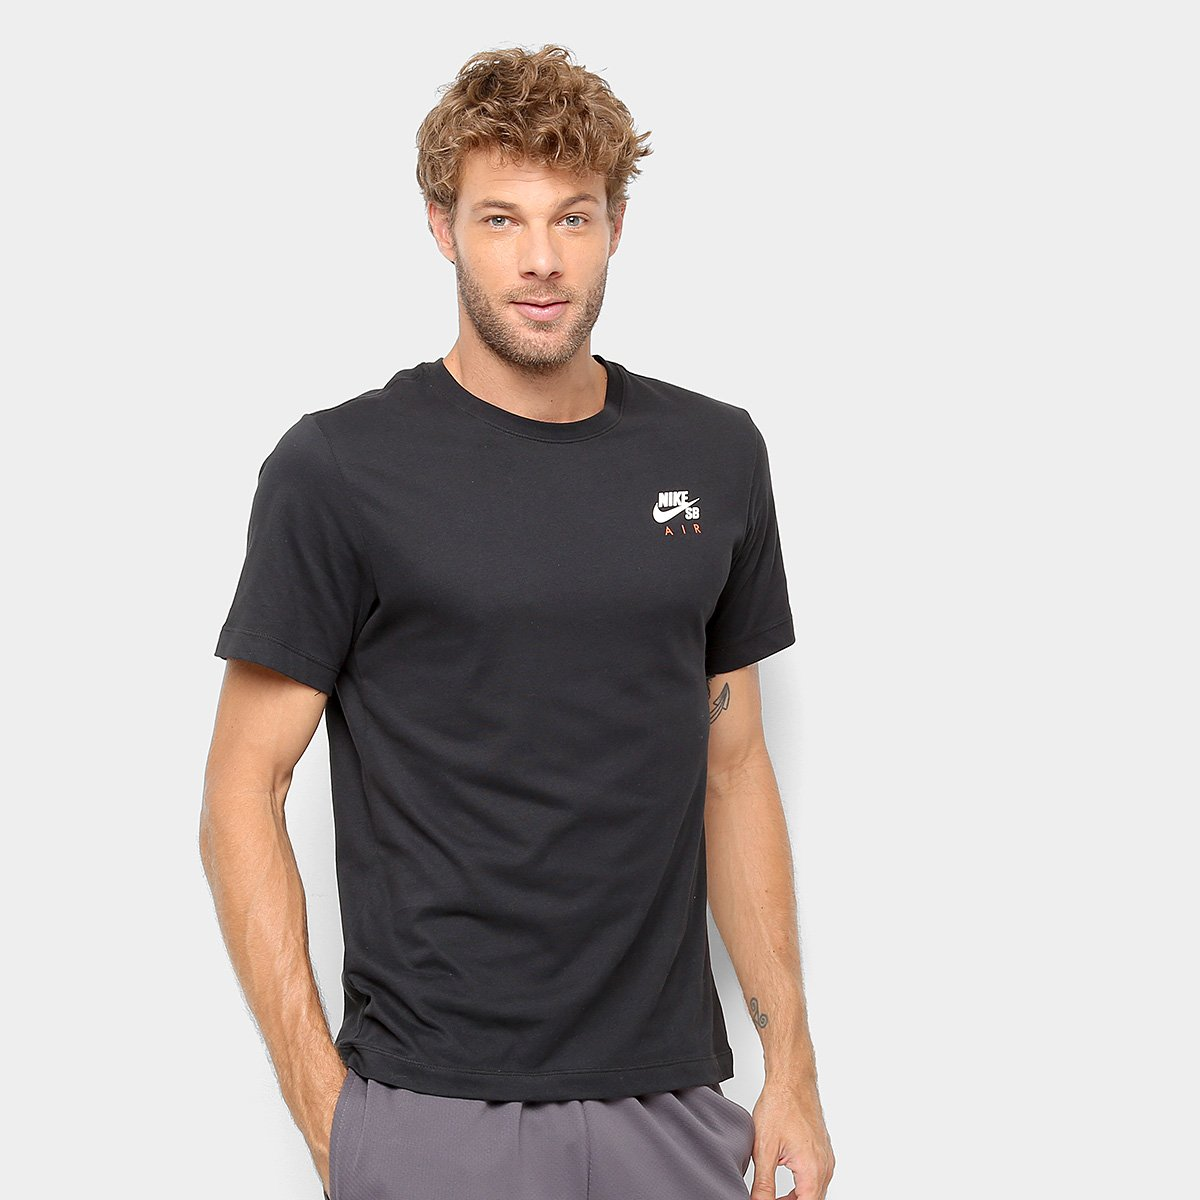 Capataz administración Infantil  Camiseta Nike SB Básica Estampada Dry Air Masculina | Netshoes